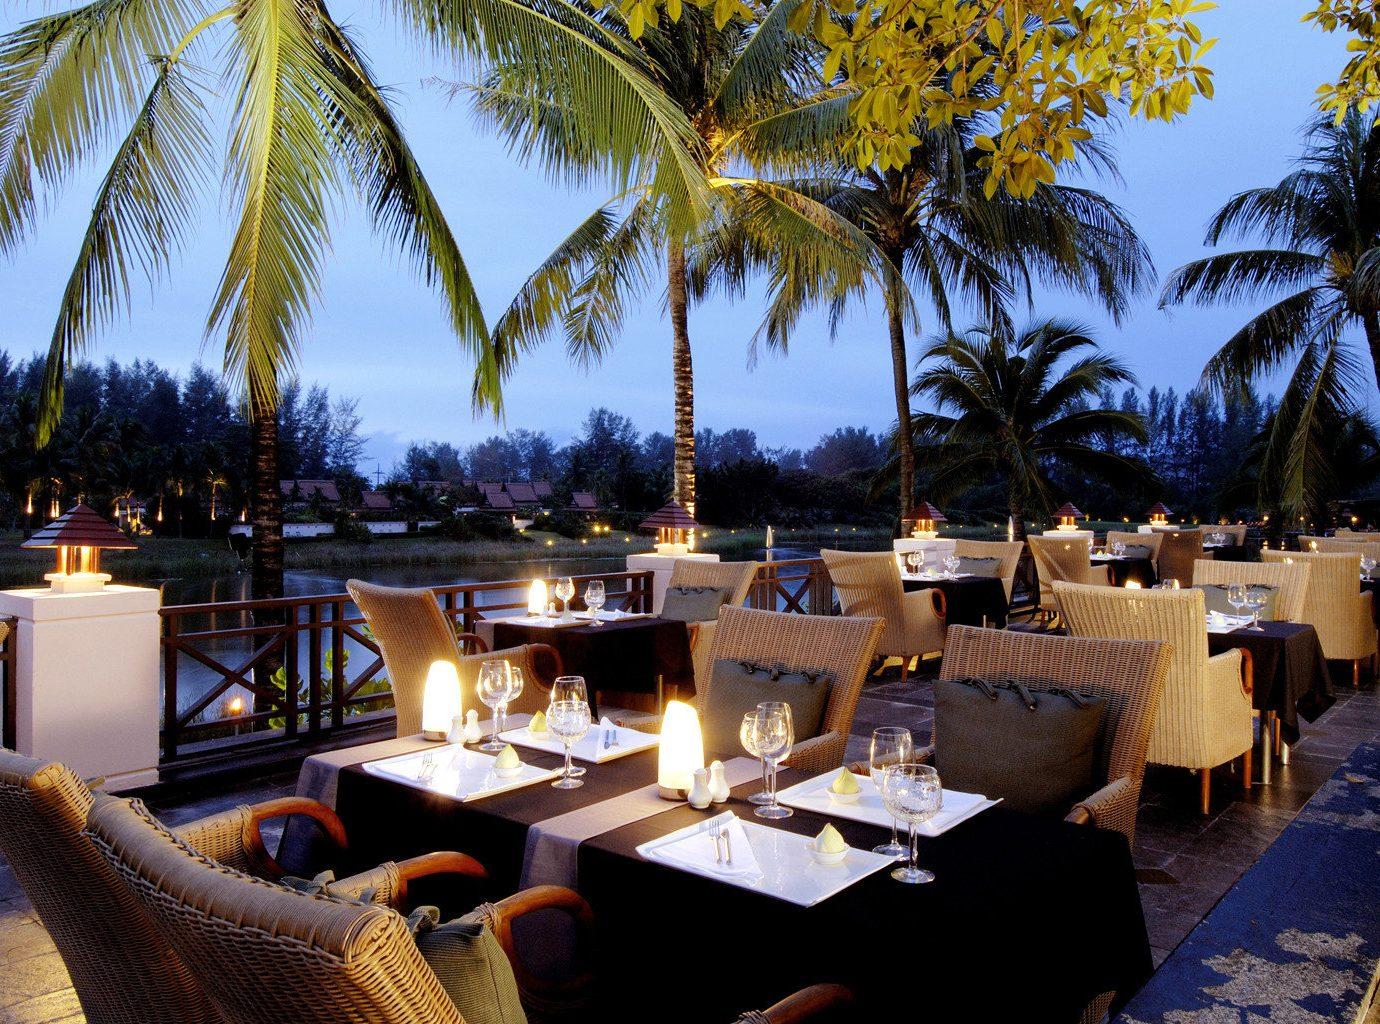 Beachfront Dining Drink Eat Honeymoon Hotels Luxury Romantic Wellness tree outdoor palm Resort restaurant estate meal